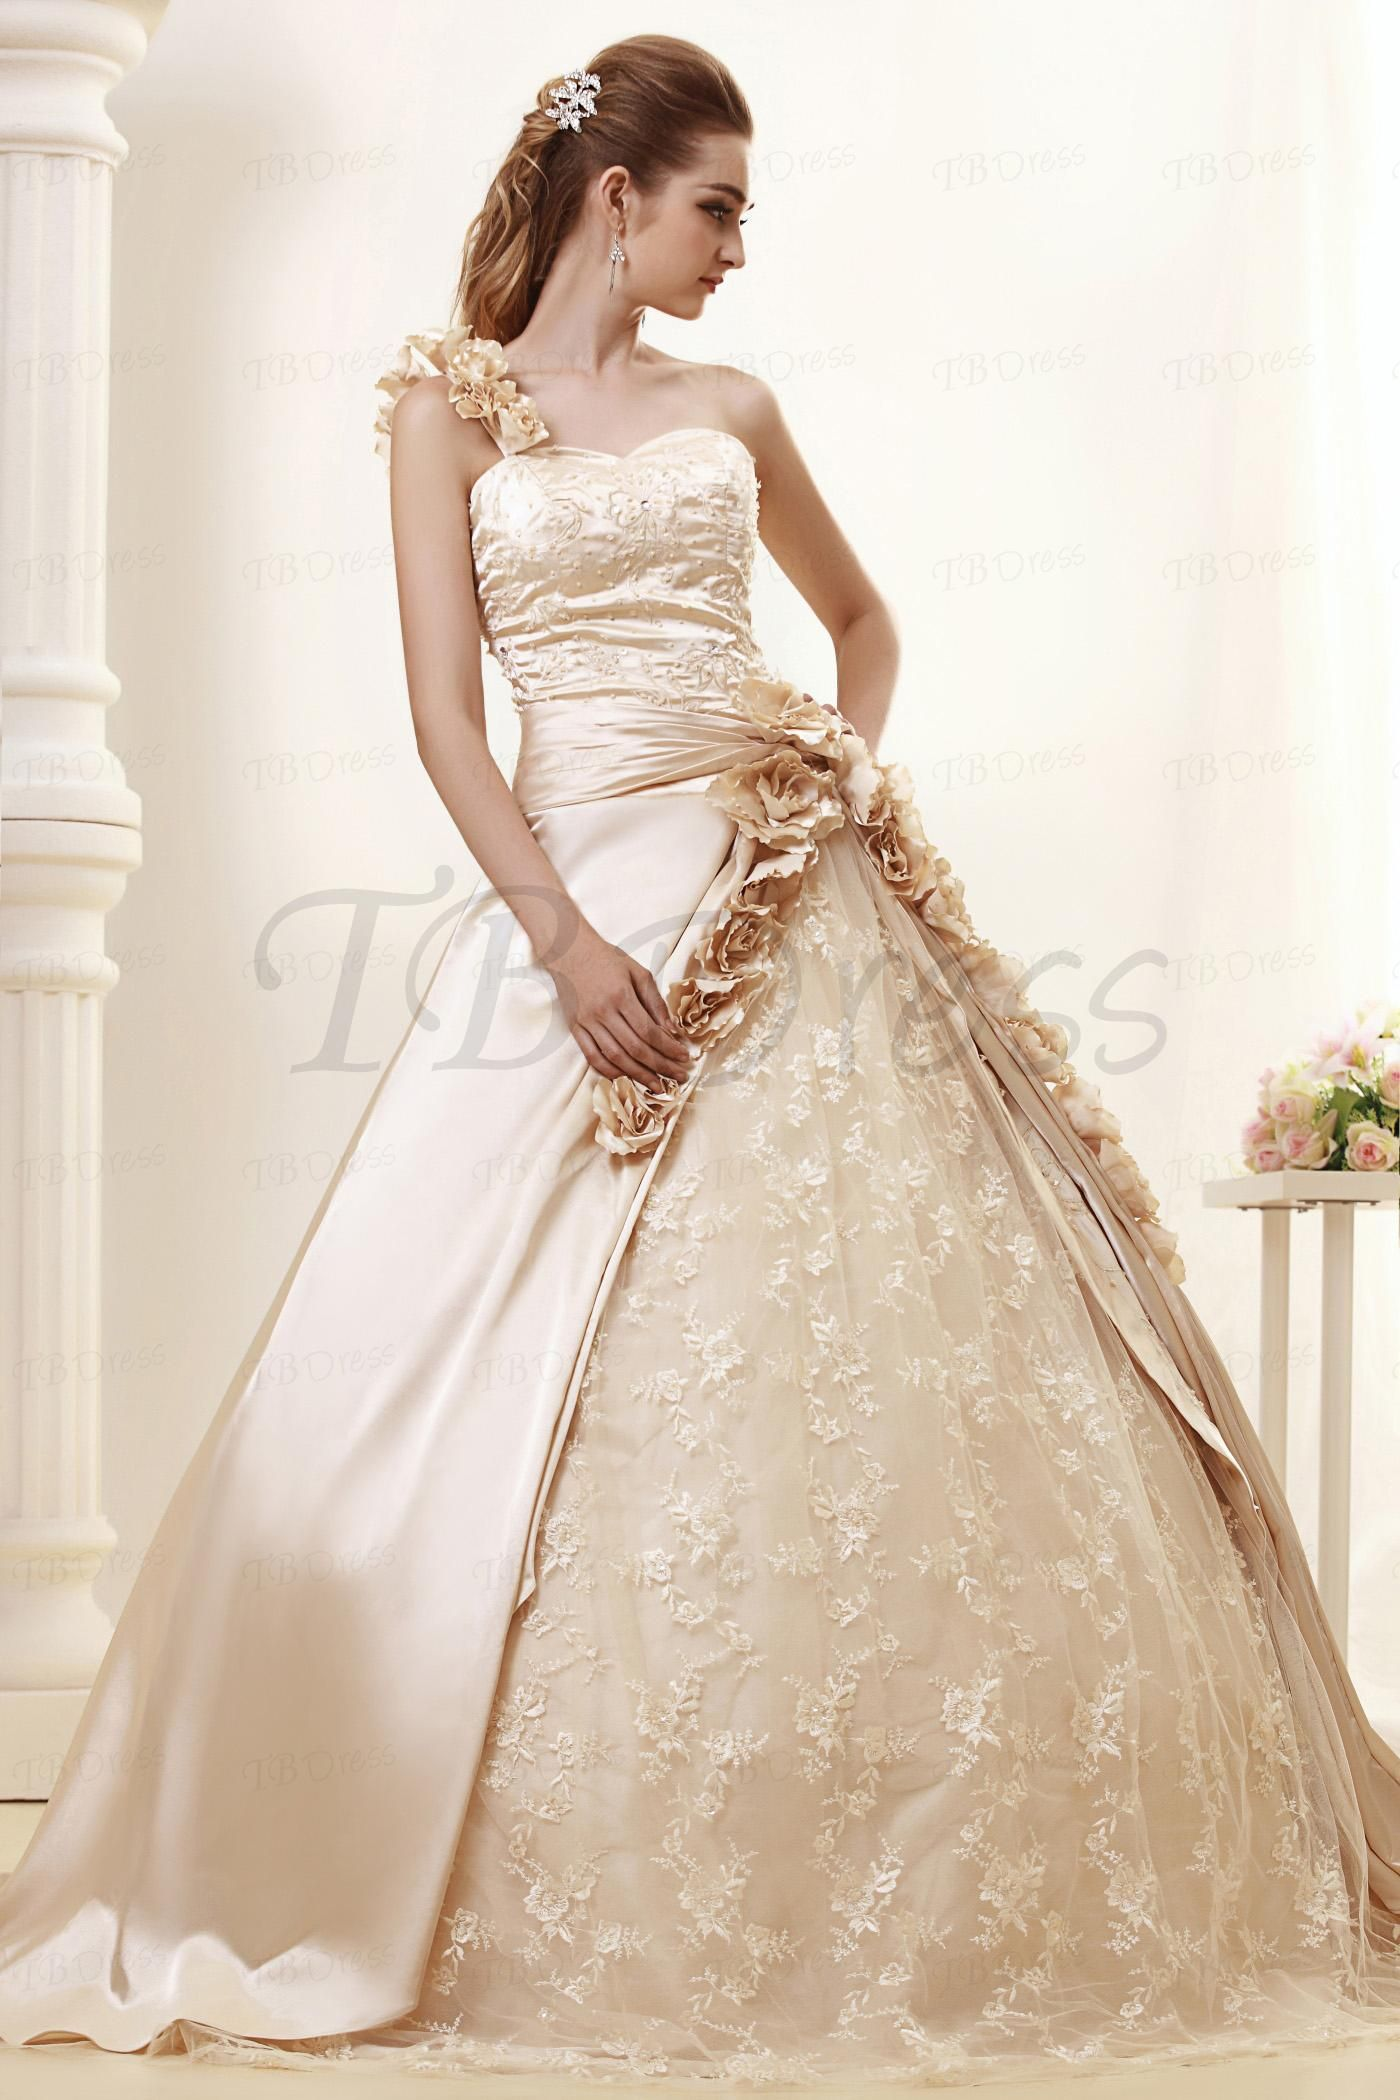 b782cb11095 One-shoulder Ball Gown Royal Angerlika s Wedding Dress